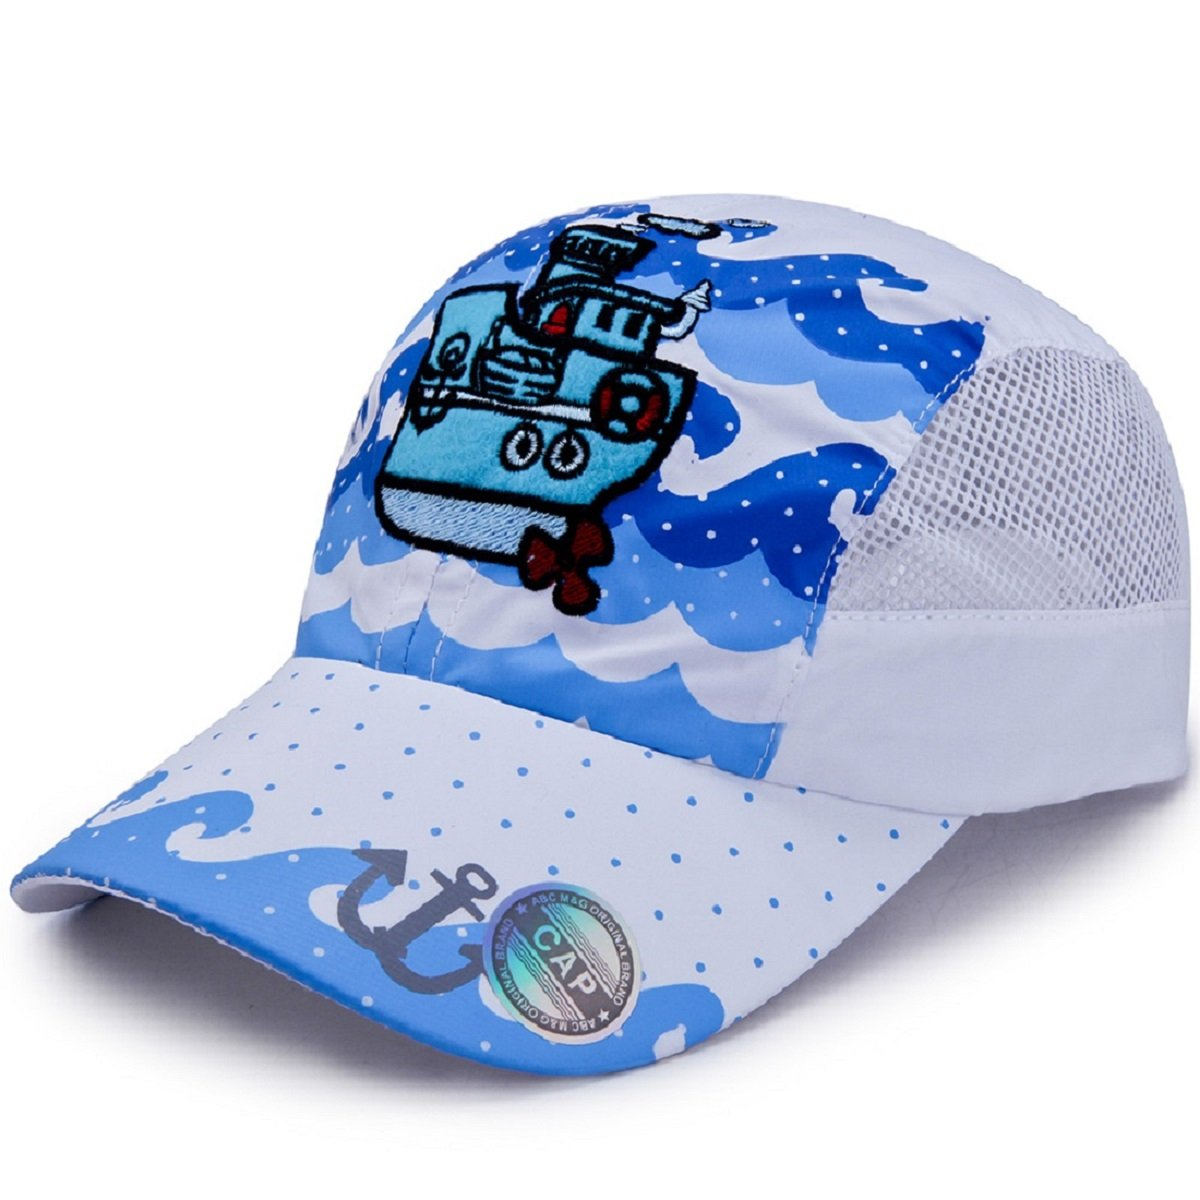 LLmoway Outdoor Kids Boys Summer Baseball Cap UPF50+ Sun Protection Mesh Running Hat Quick Dry White